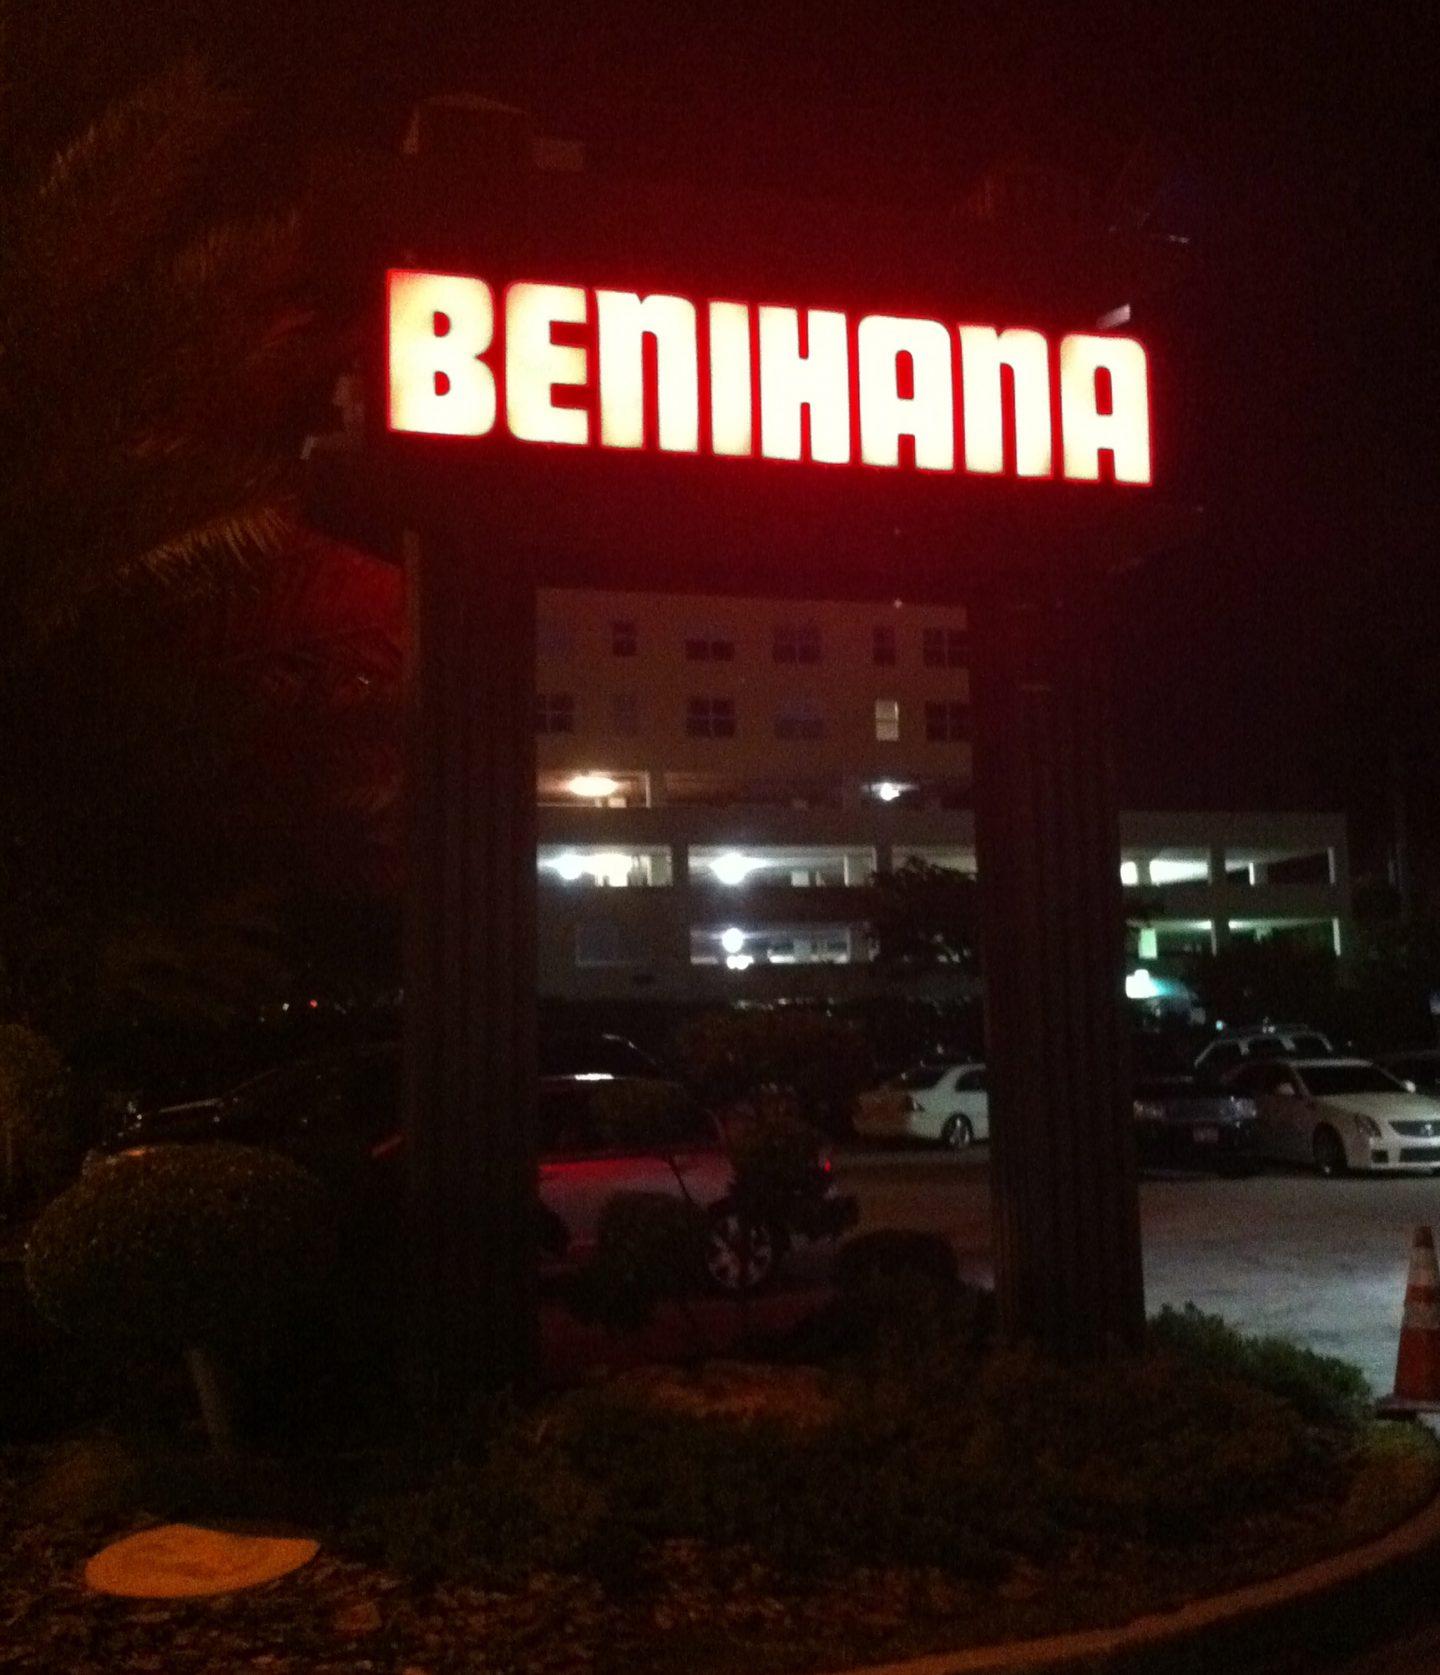 Benihana Miami